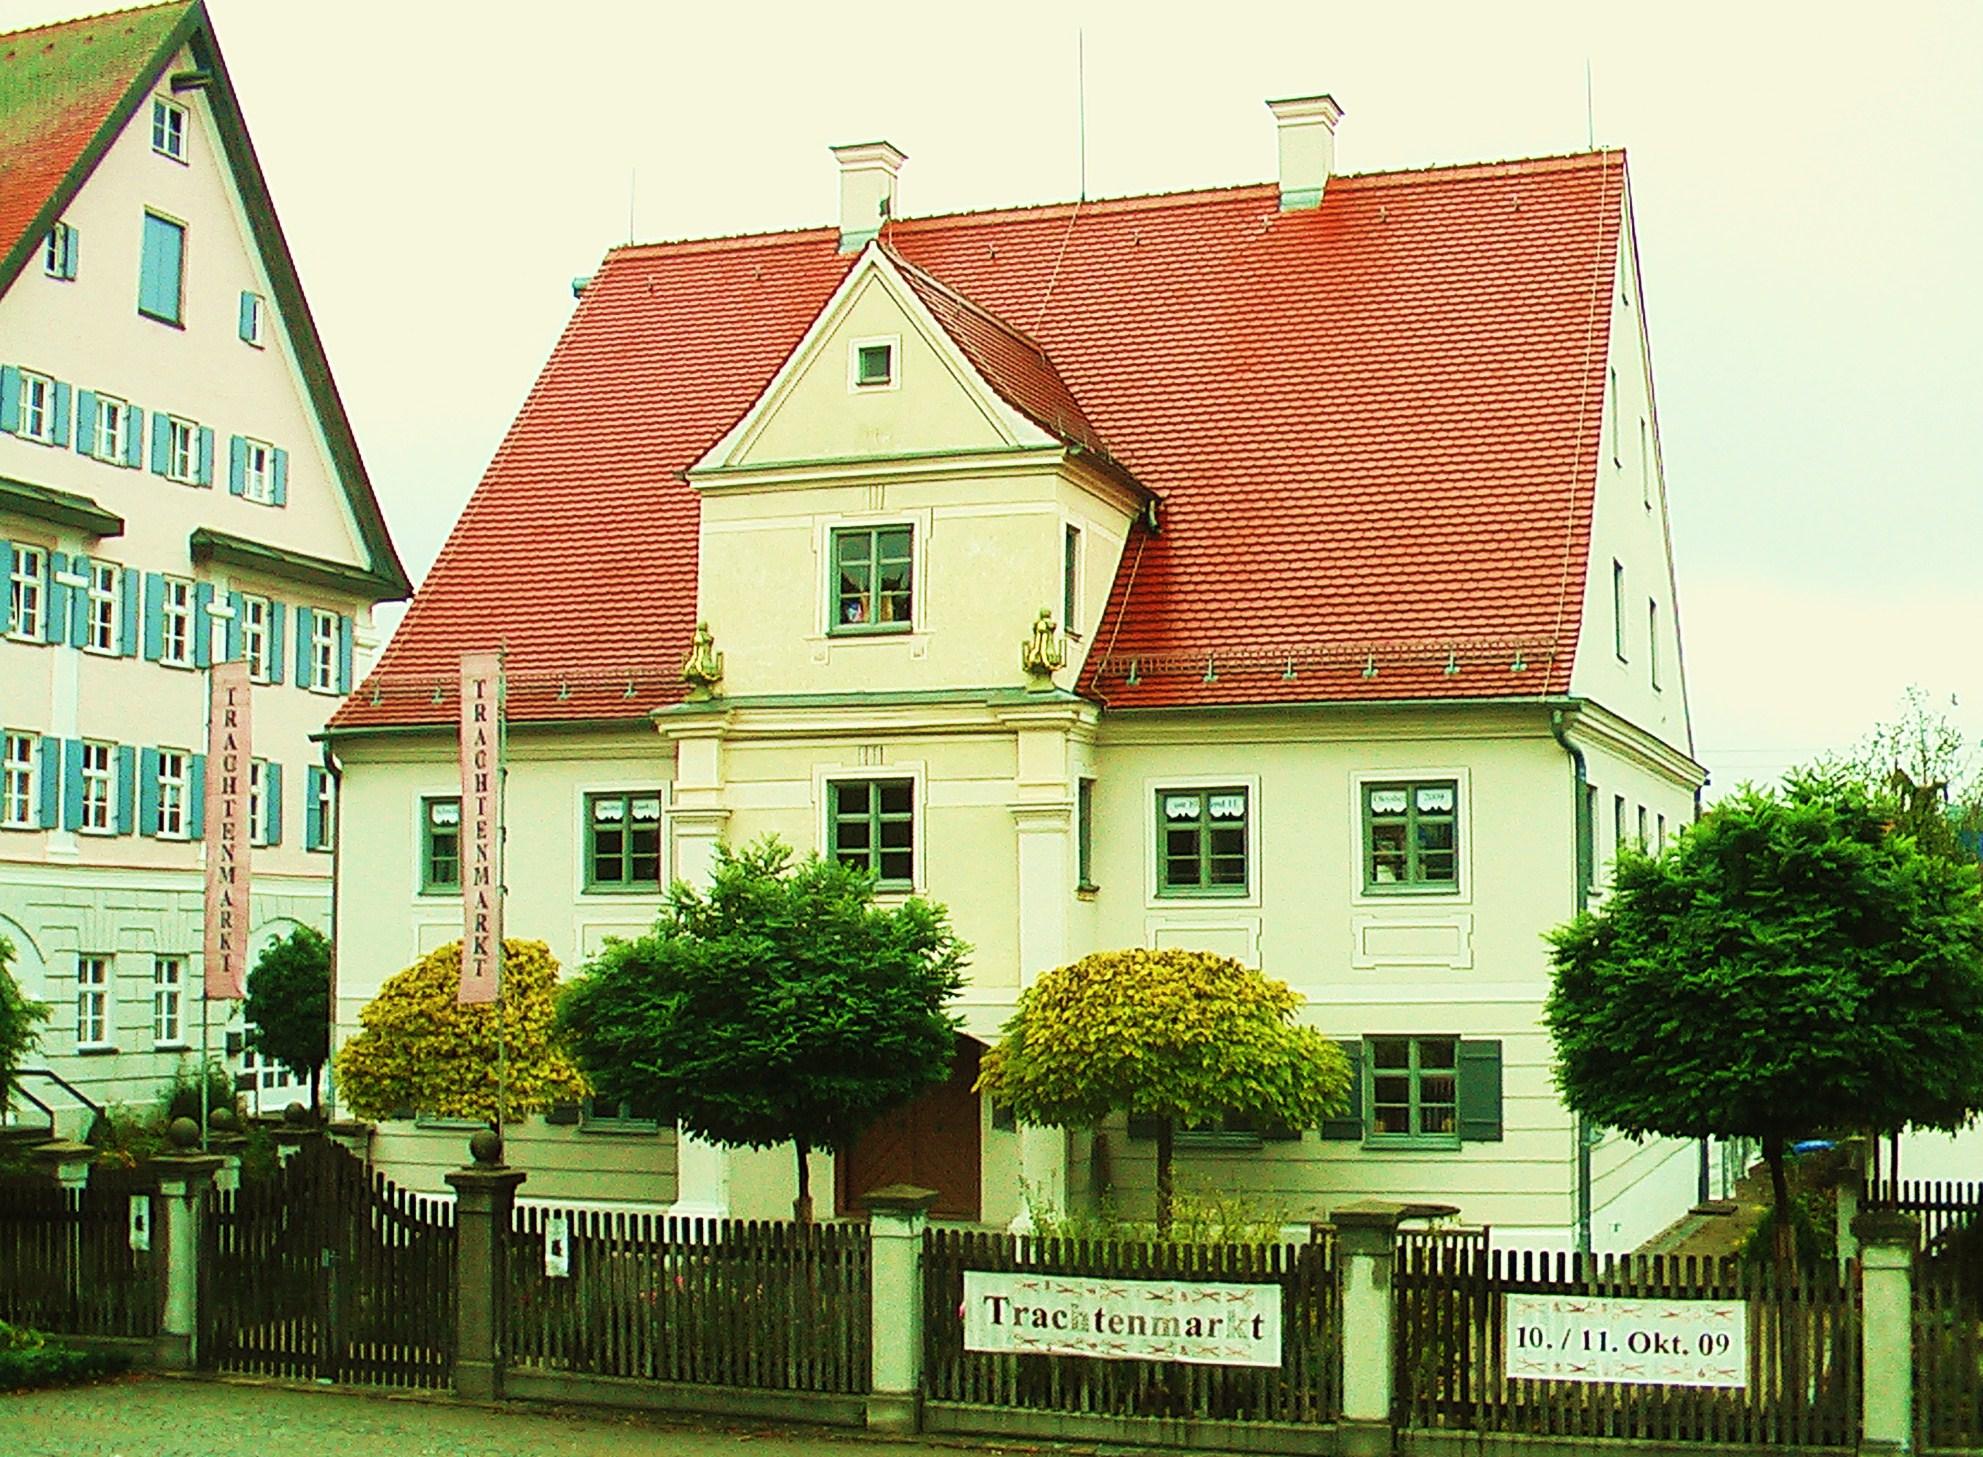 constructed by Loeb Landauer in 1801